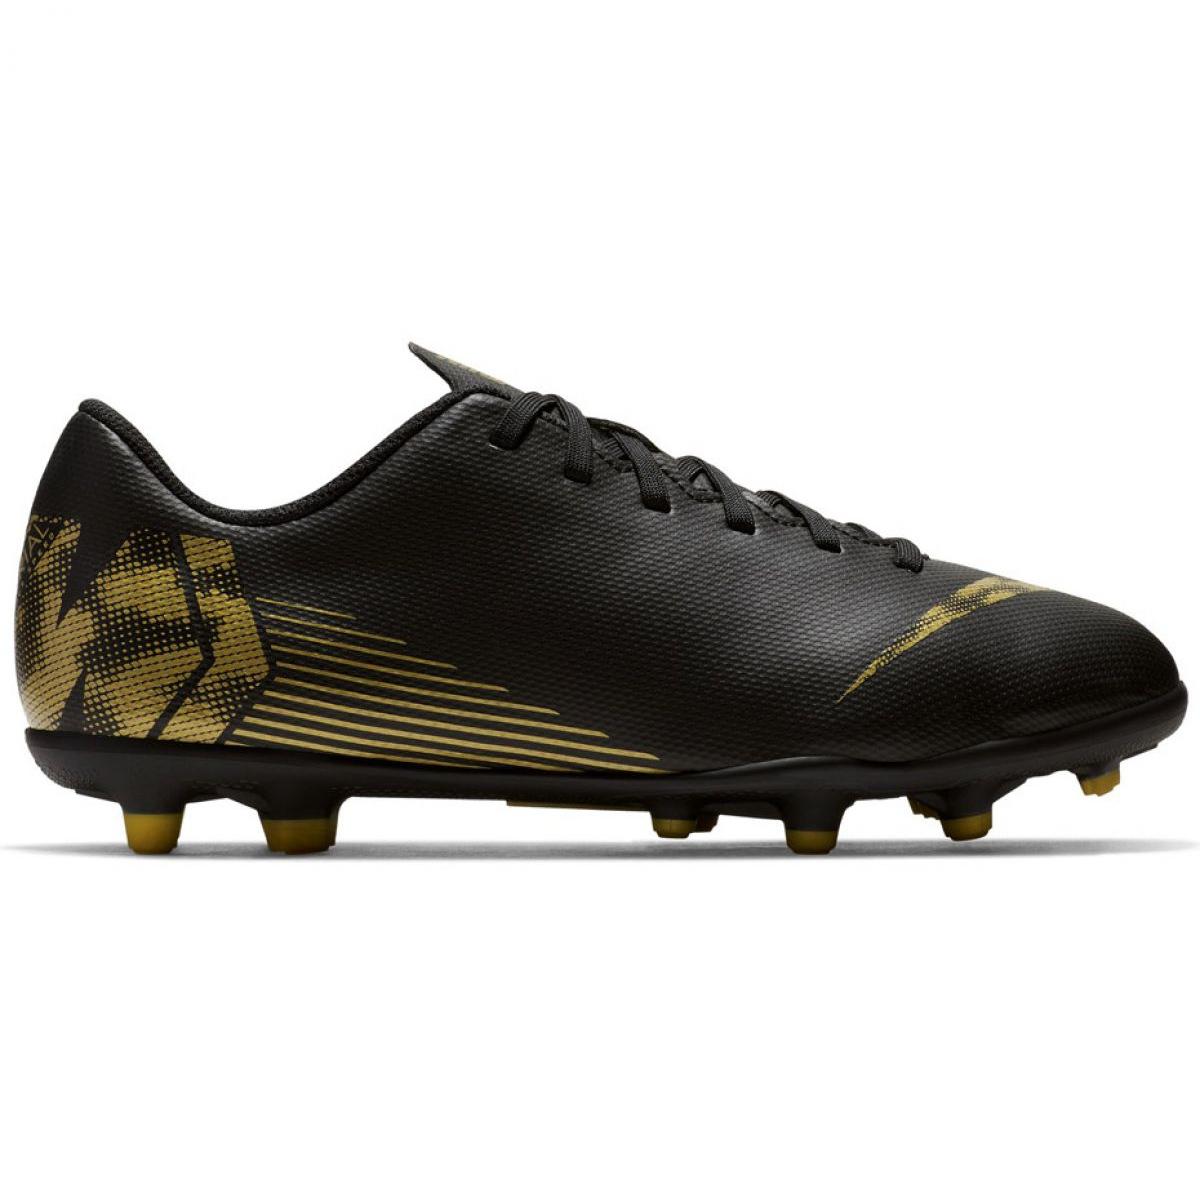 21b1882b5 Scarpe da calcio Nike Mercurial Vapor 12 Club Mg Jr AH7350-077 ...